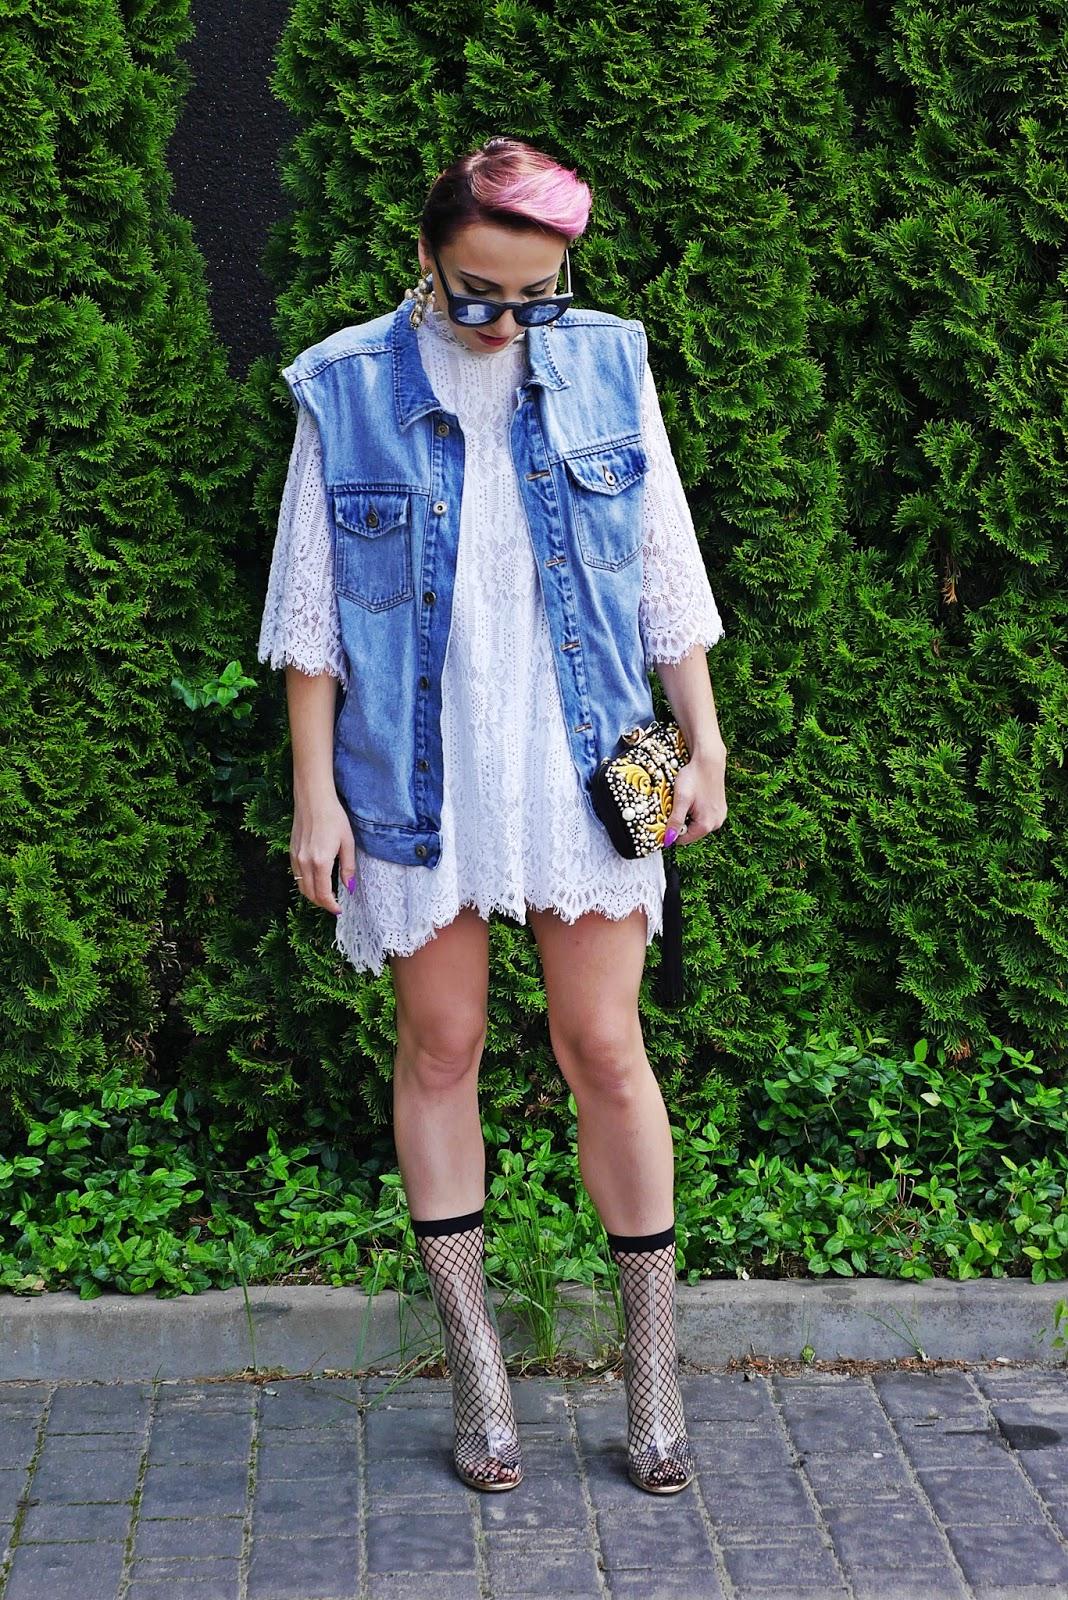 lace_dress_transparent_yezzy_shoes_karyn_blog_modowy_oversize_denim_220617c